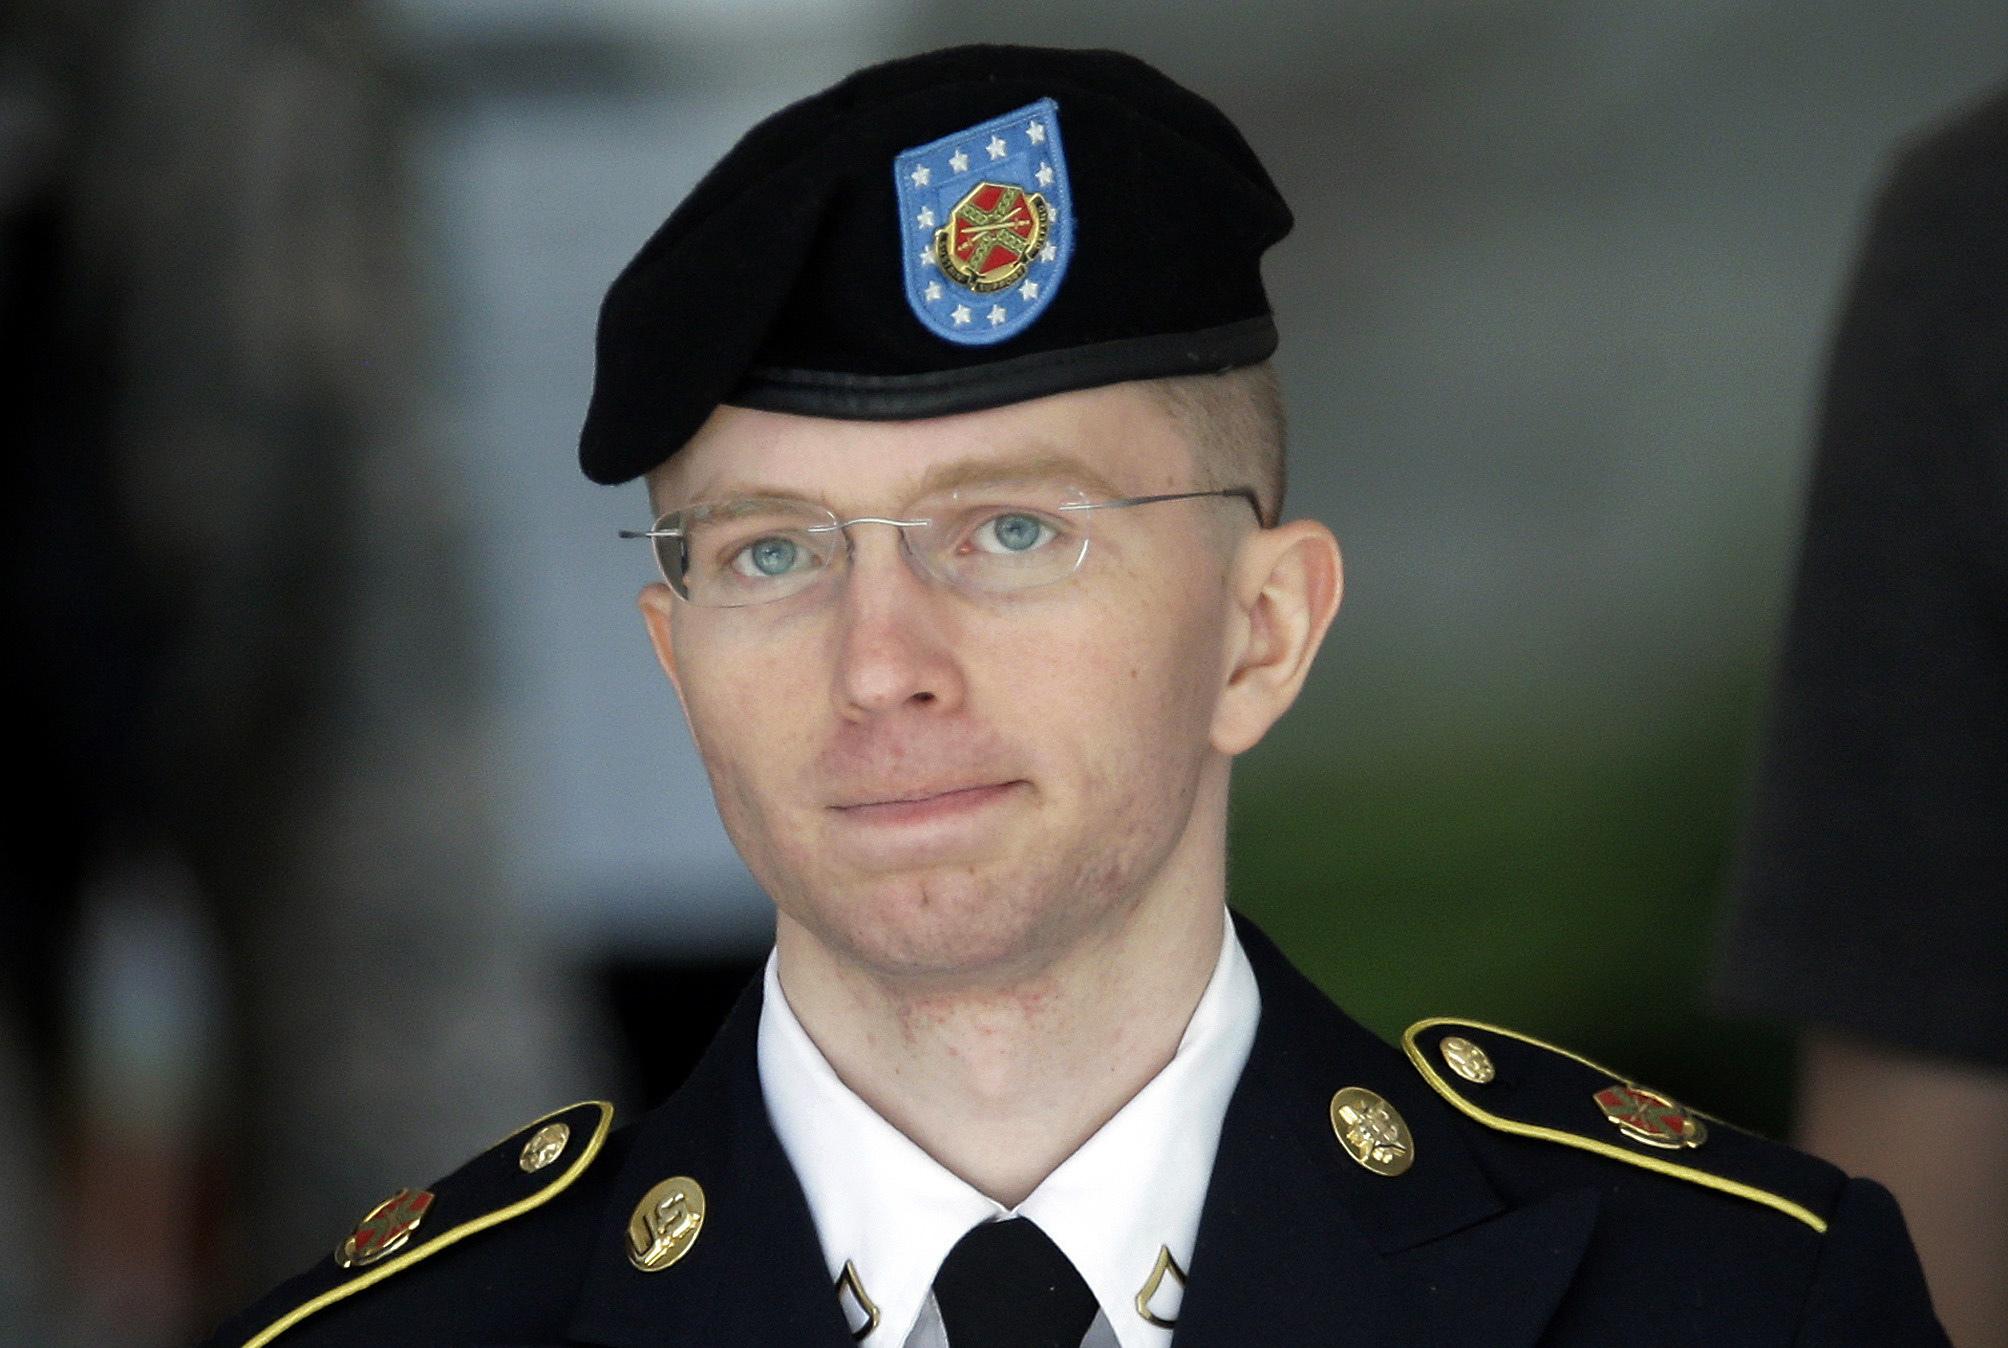 Bradley Manning Photo by Patrick Semansky, AP Photo_328959